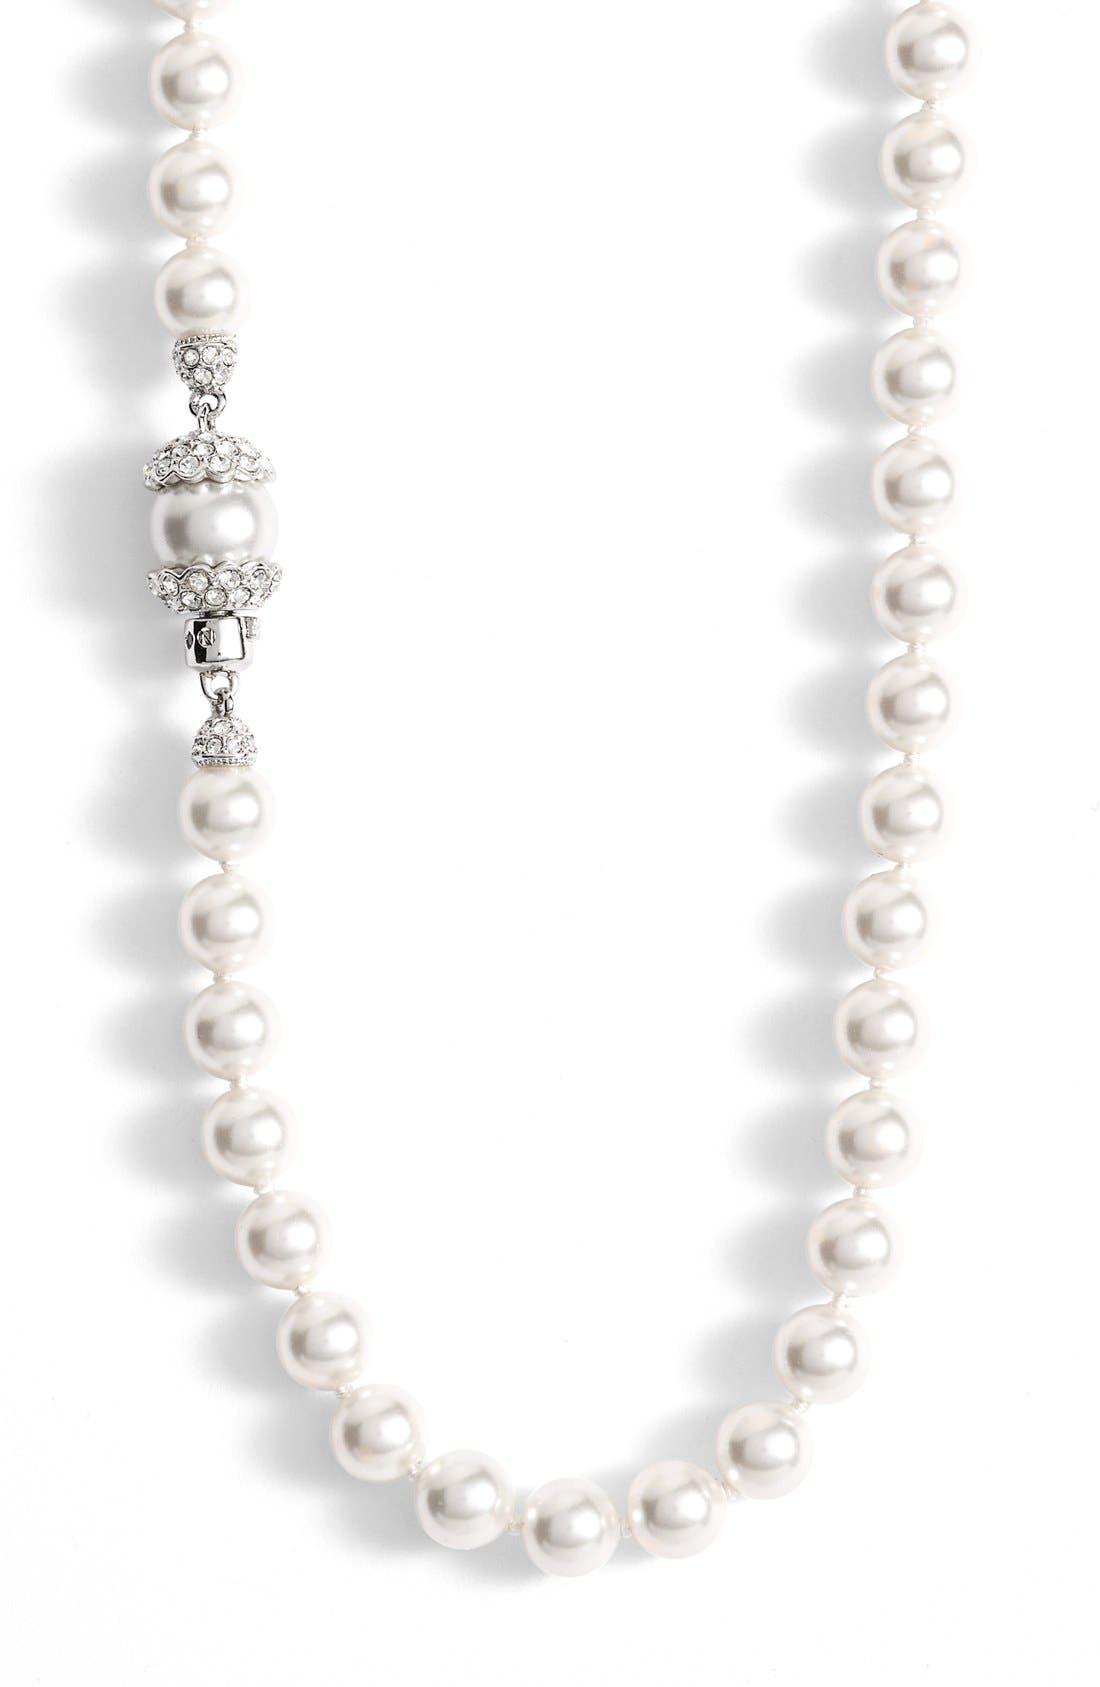 Imitation Pearl Long Necklace,                             Alternate thumbnail 2, color,                             RHODIUM